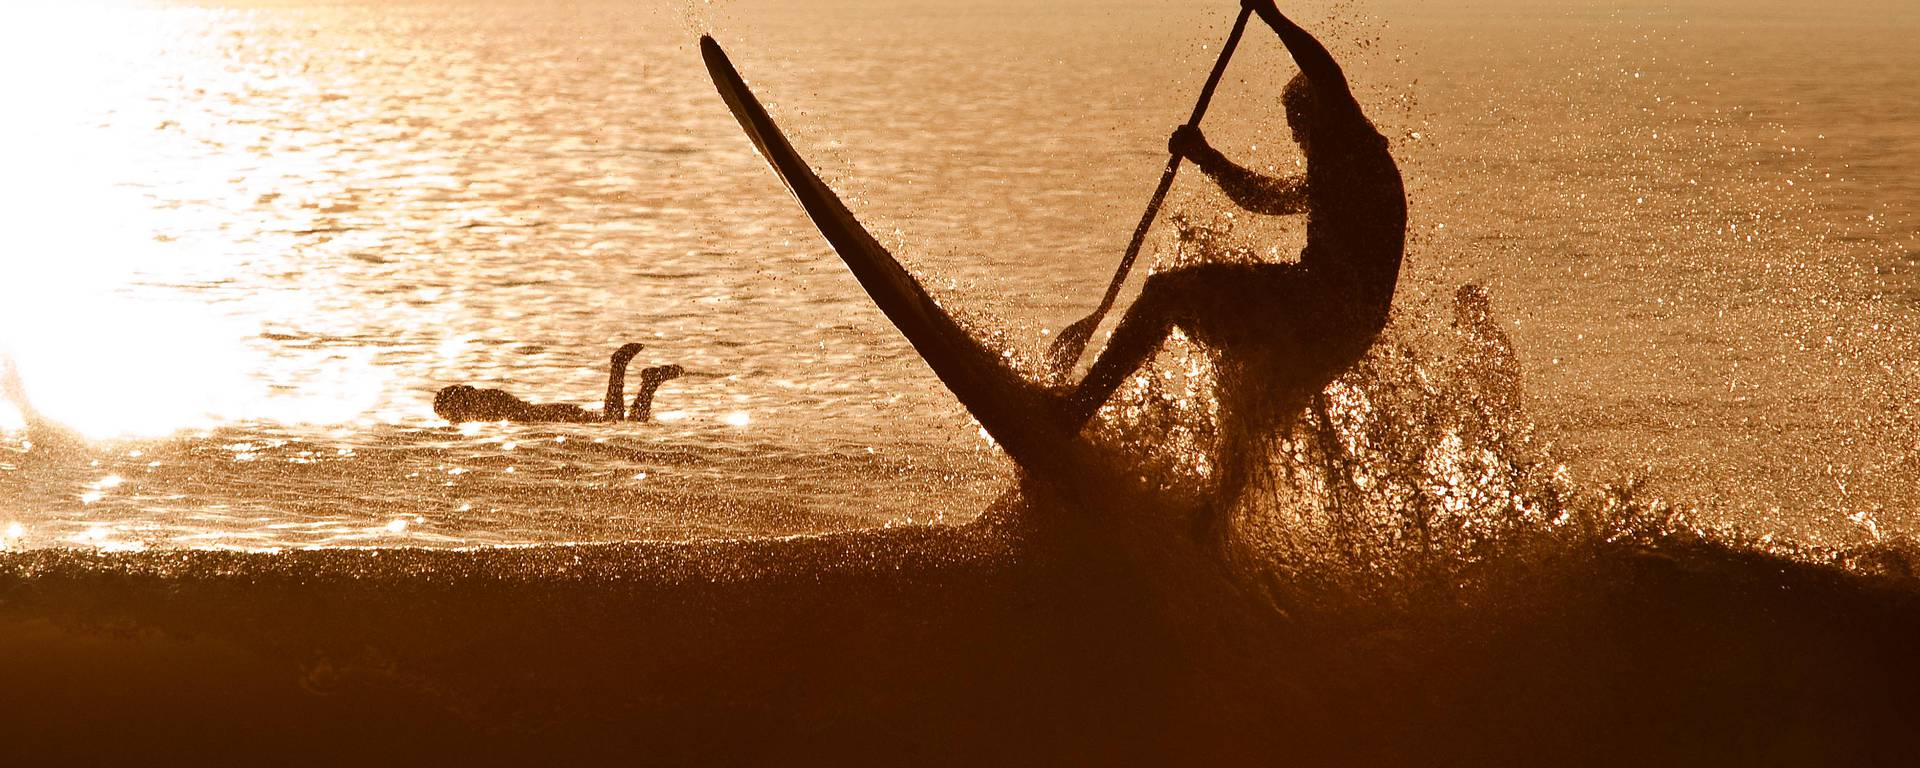 Le paddle en mer par François Blanchard